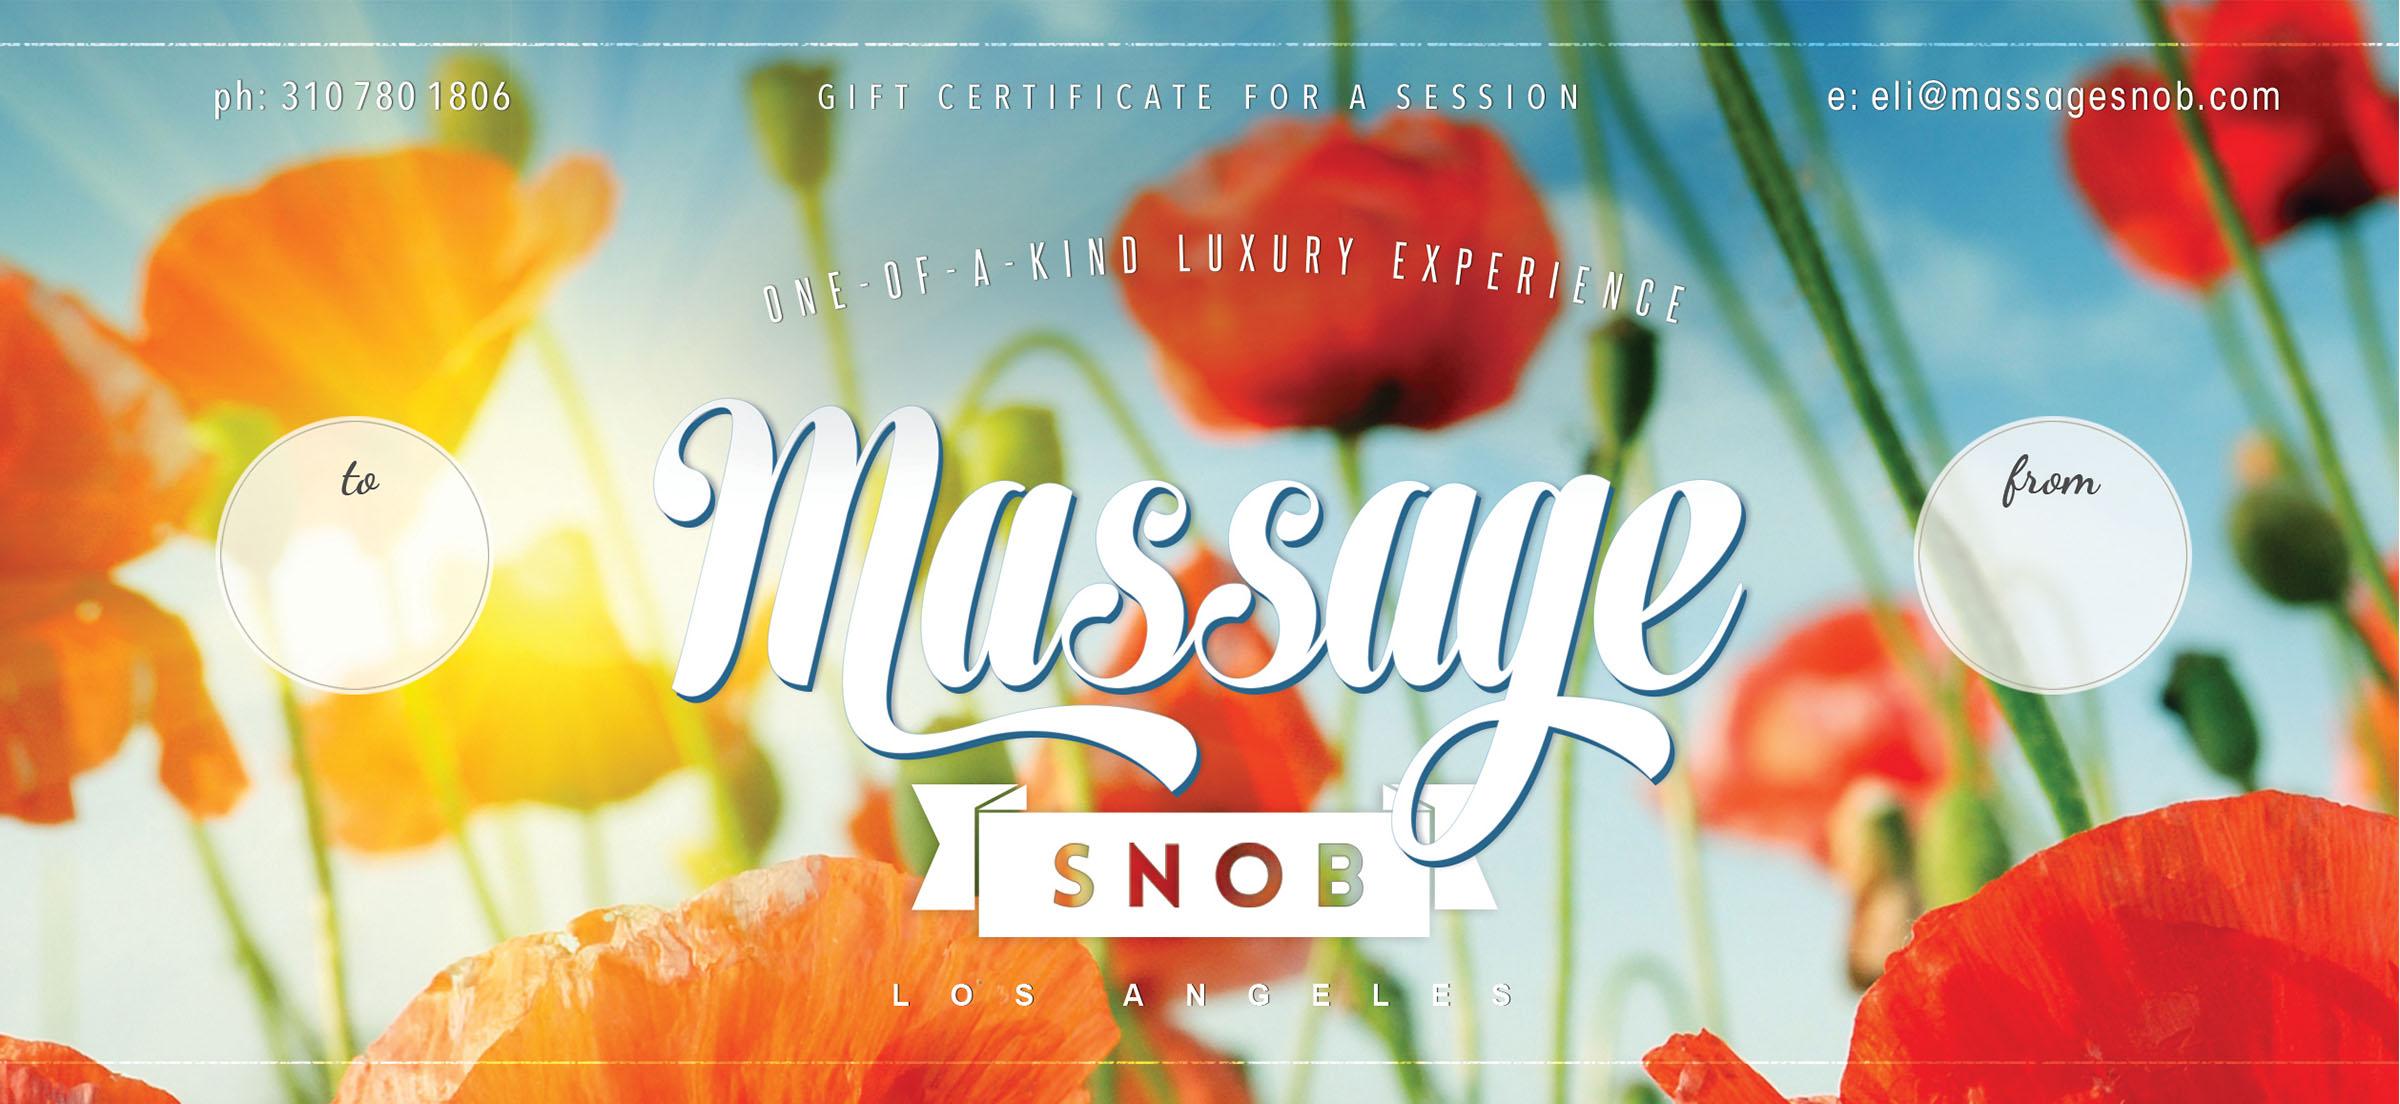 Massage Snob Gift Certificate Poppies